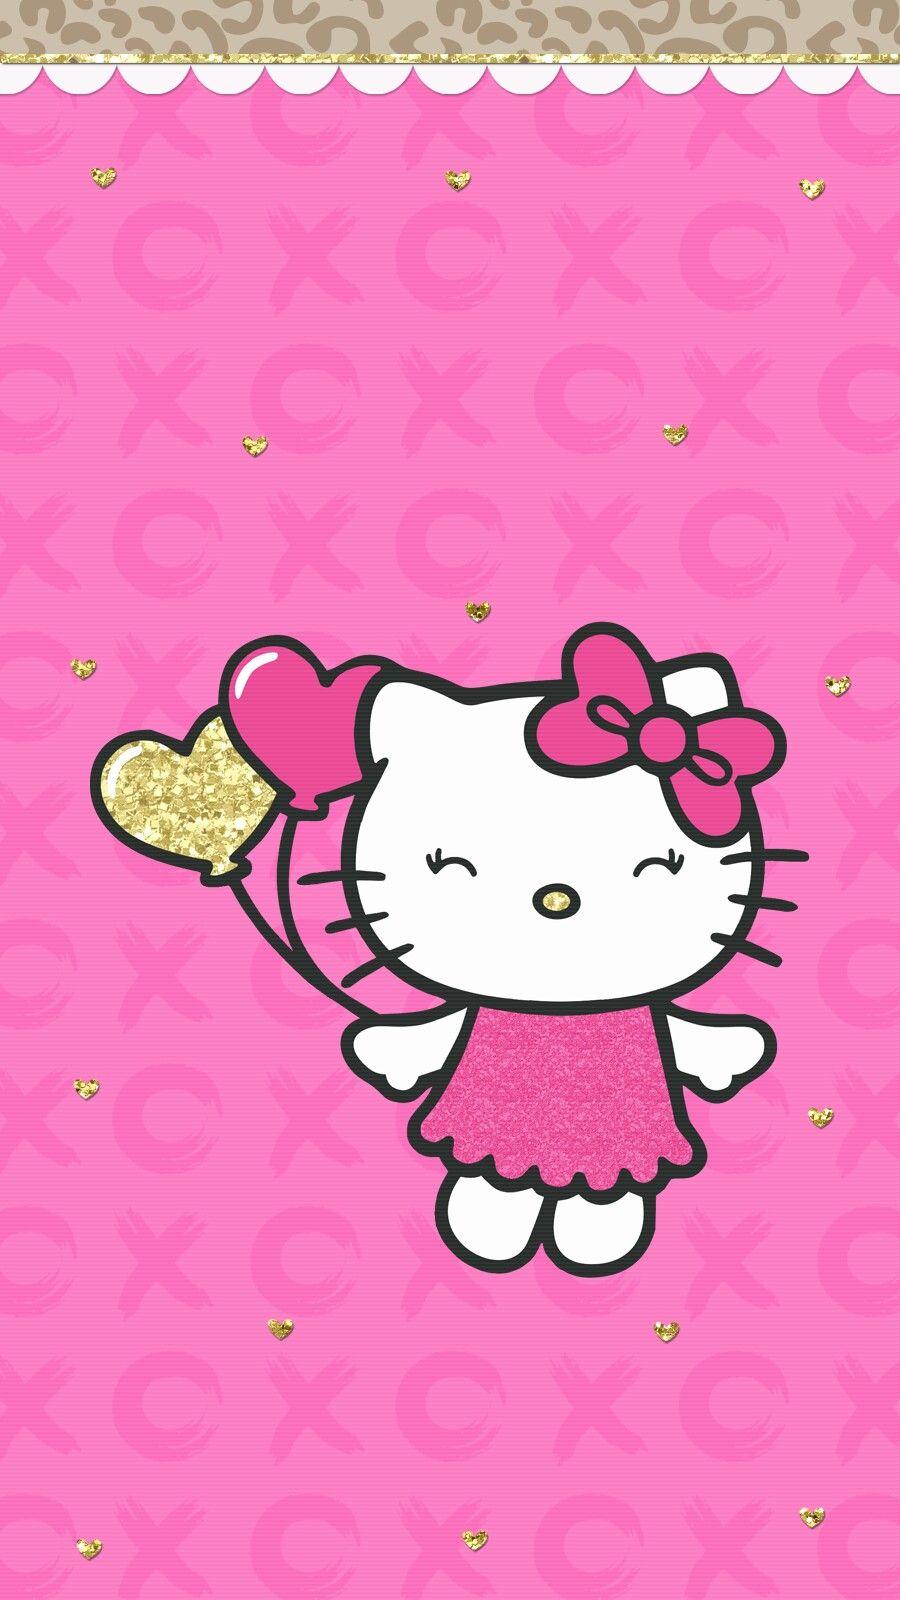 Digitalcutewalls Hello Kitty Backgrounds Hello Kitty Wallpaper Hd Hello Kitty Images